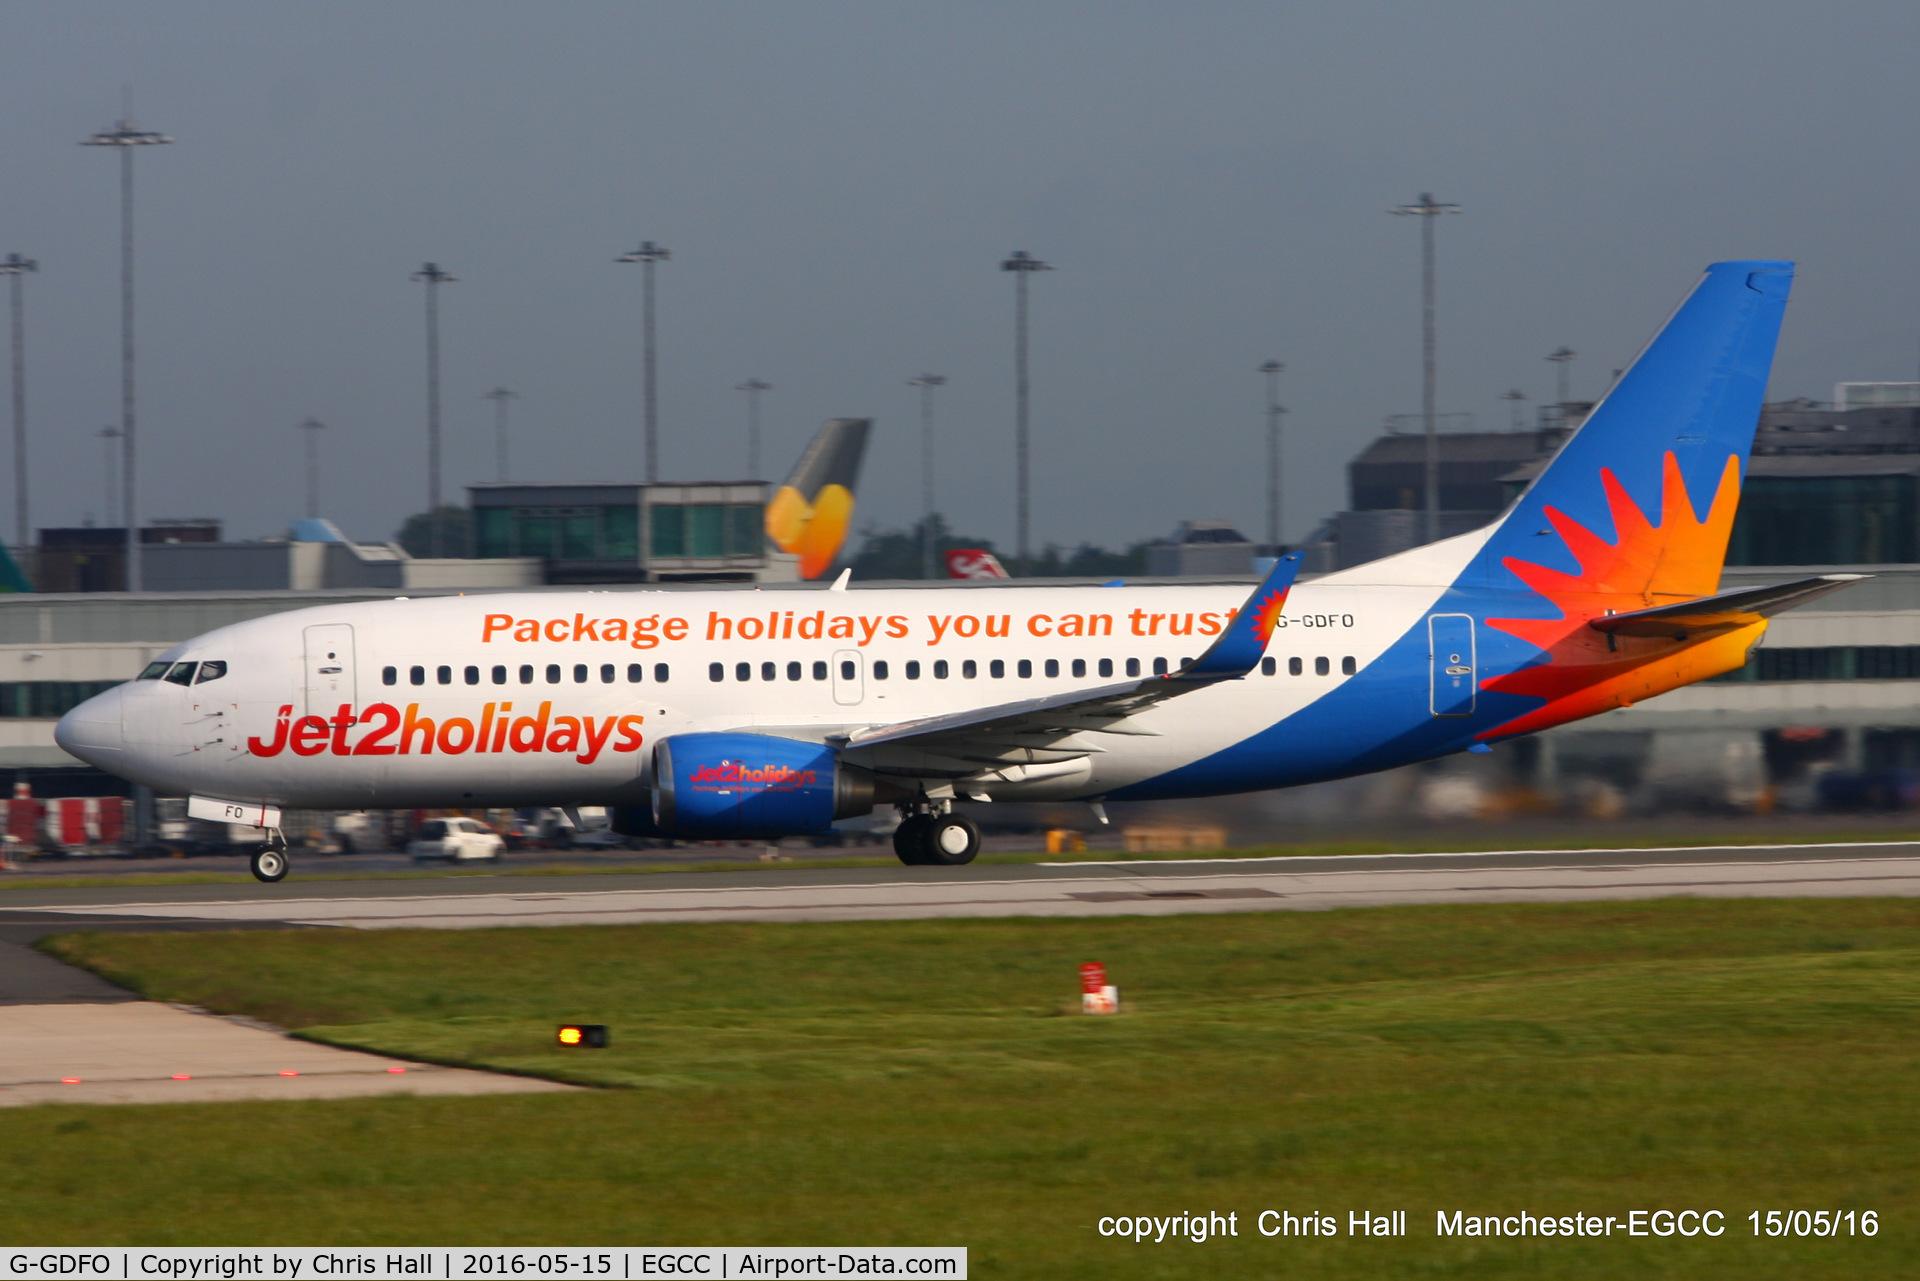 G-GDFO, 1998 Boeing 737-3U3 C/N 28740, Jet2